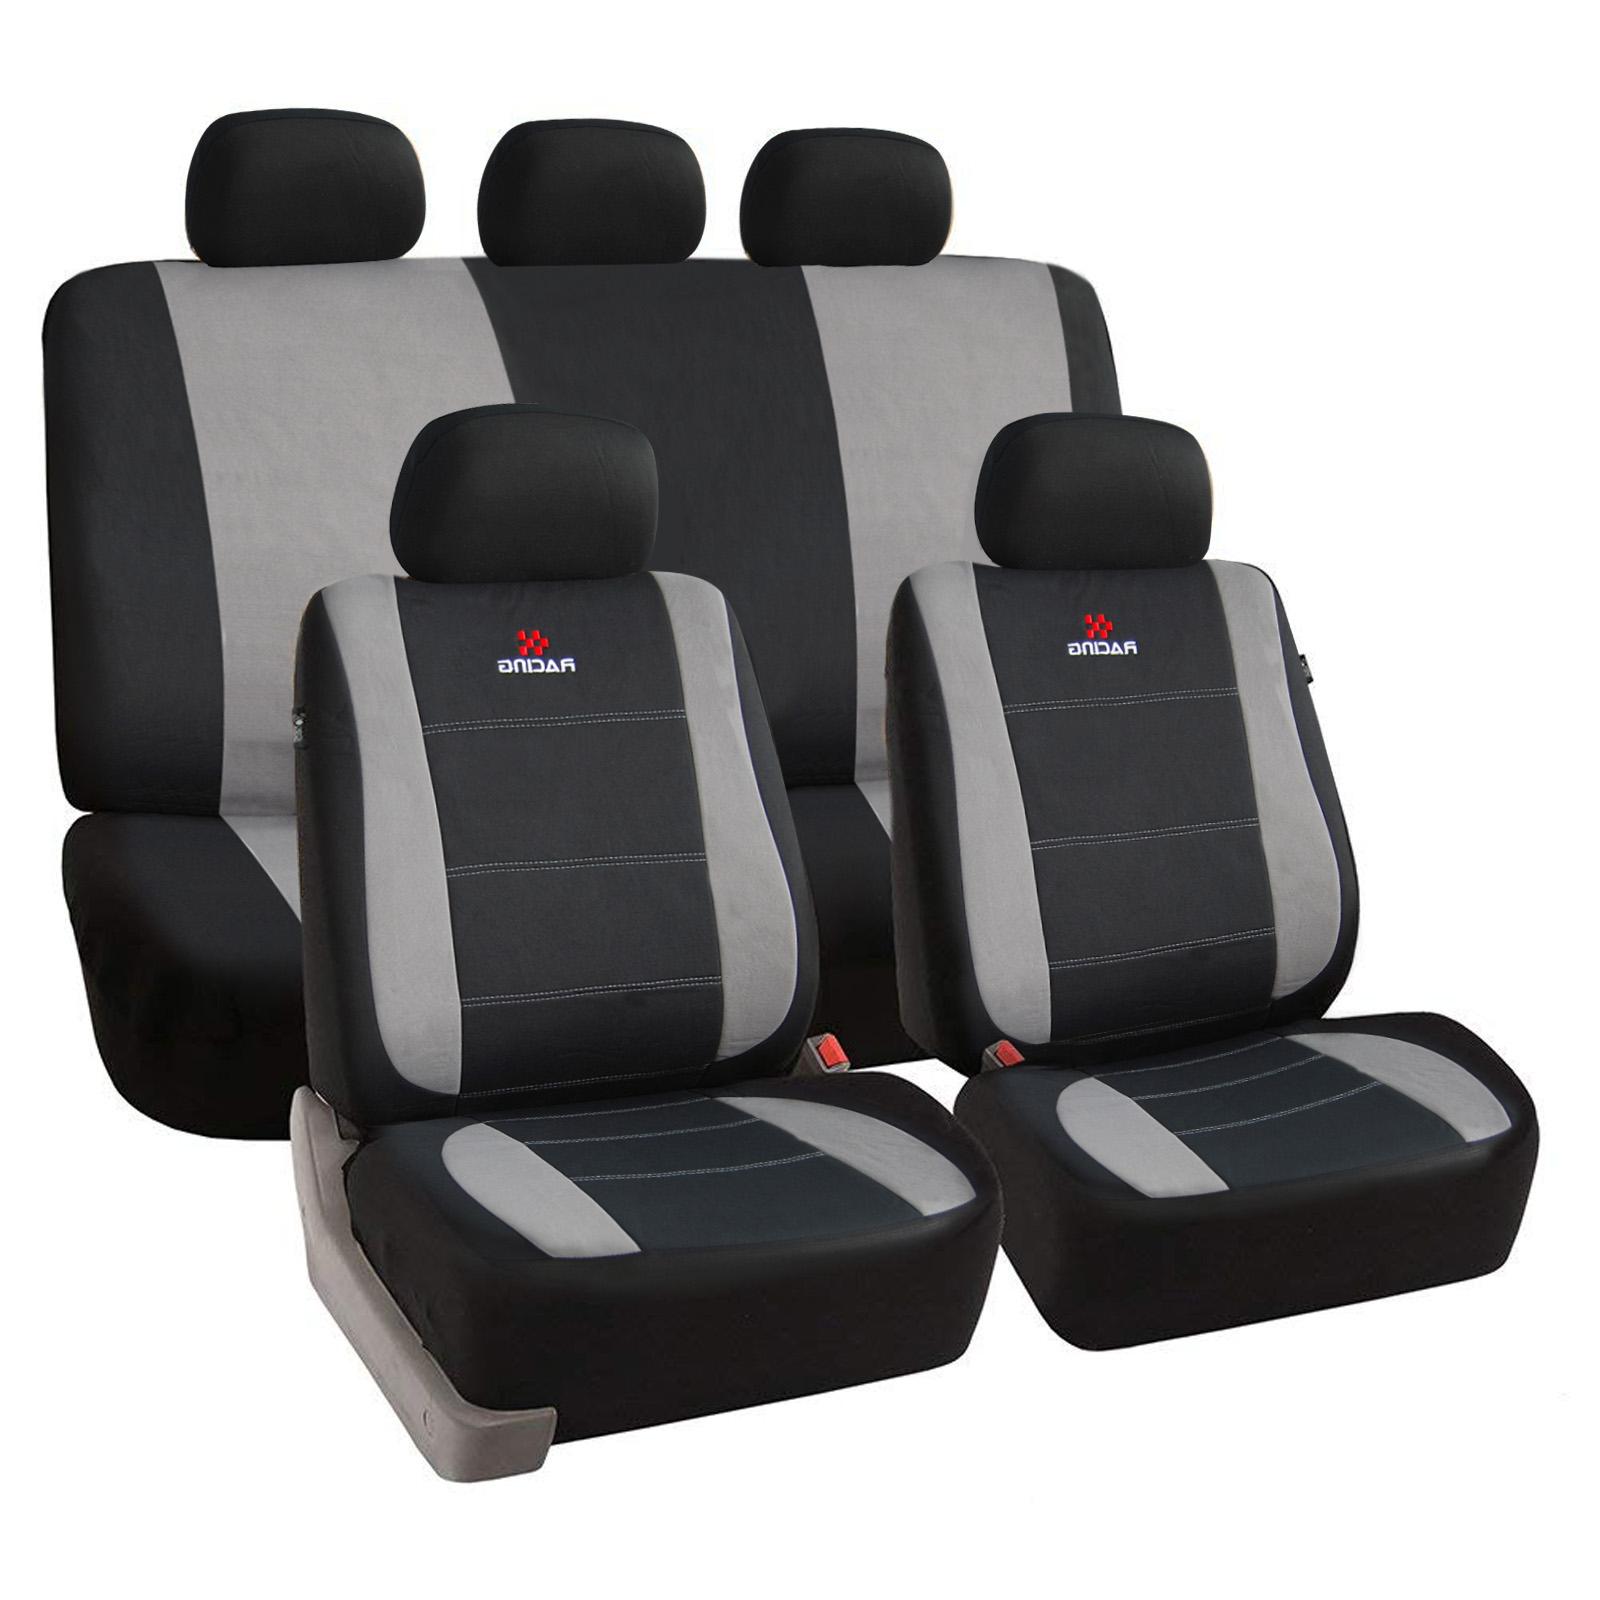 auto schonbezug komplettset sitzbez ge f r opel corsa scsc011206 ebay. Black Bedroom Furniture Sets. Home Design Ideas